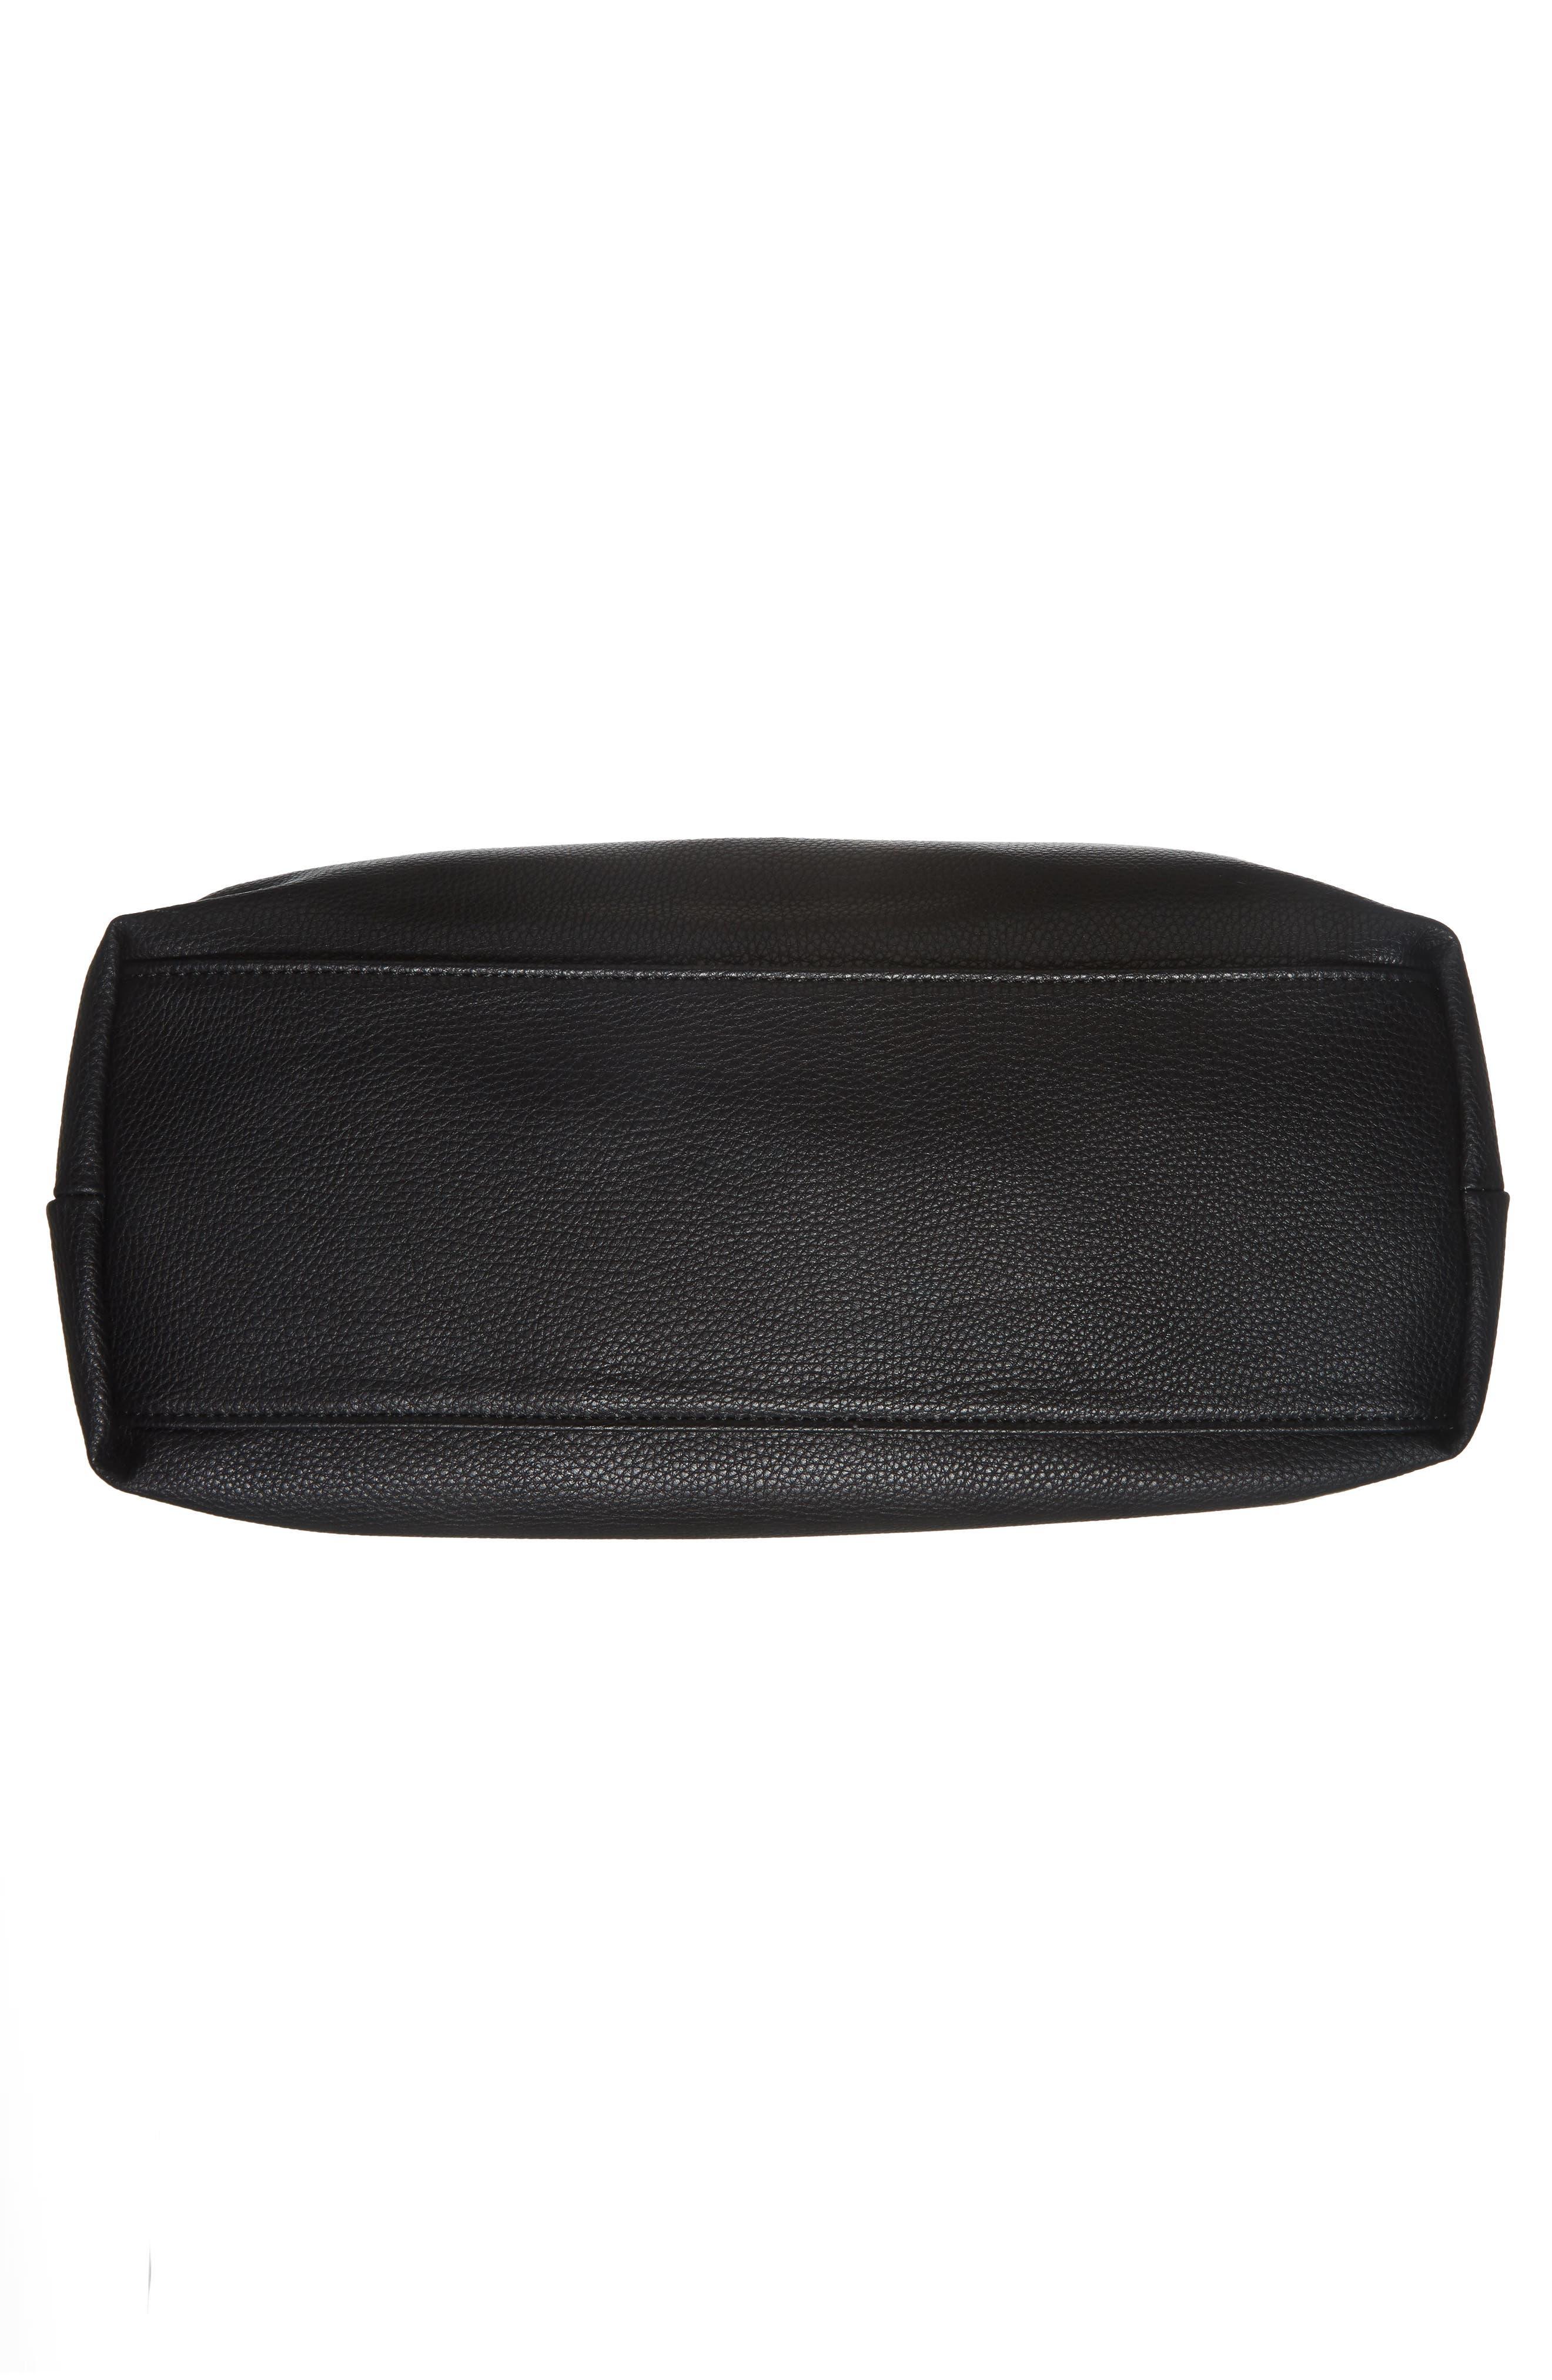 Taylor Faux Leather Shoulder Bag,                             Alternate thumbnail 16, color,